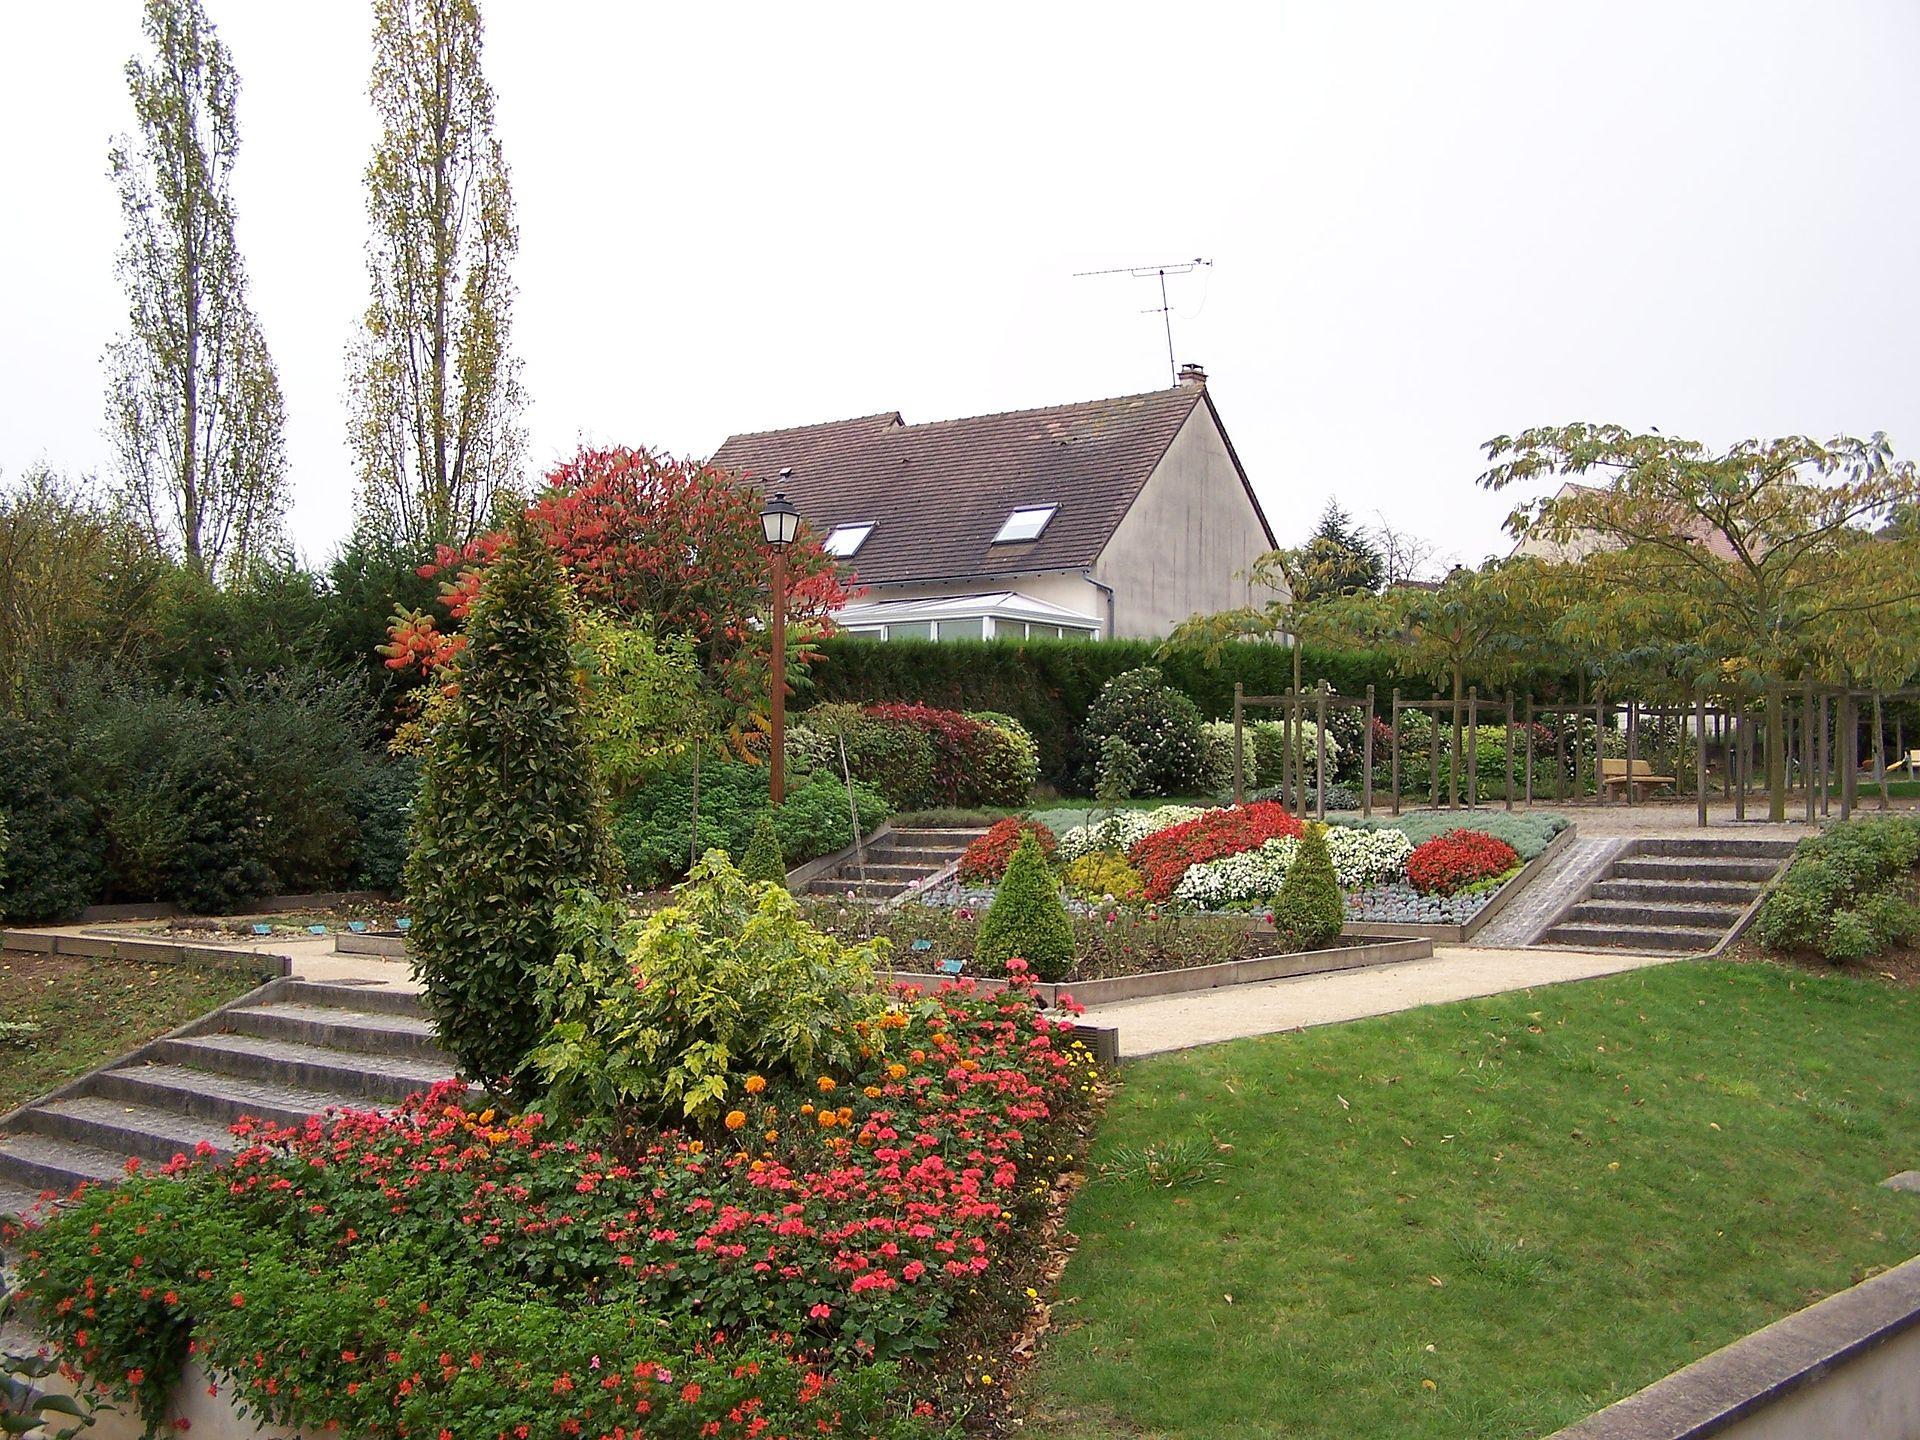 Jardin des cinq sens wikip dia for Jardin 5 sens guadeloupe